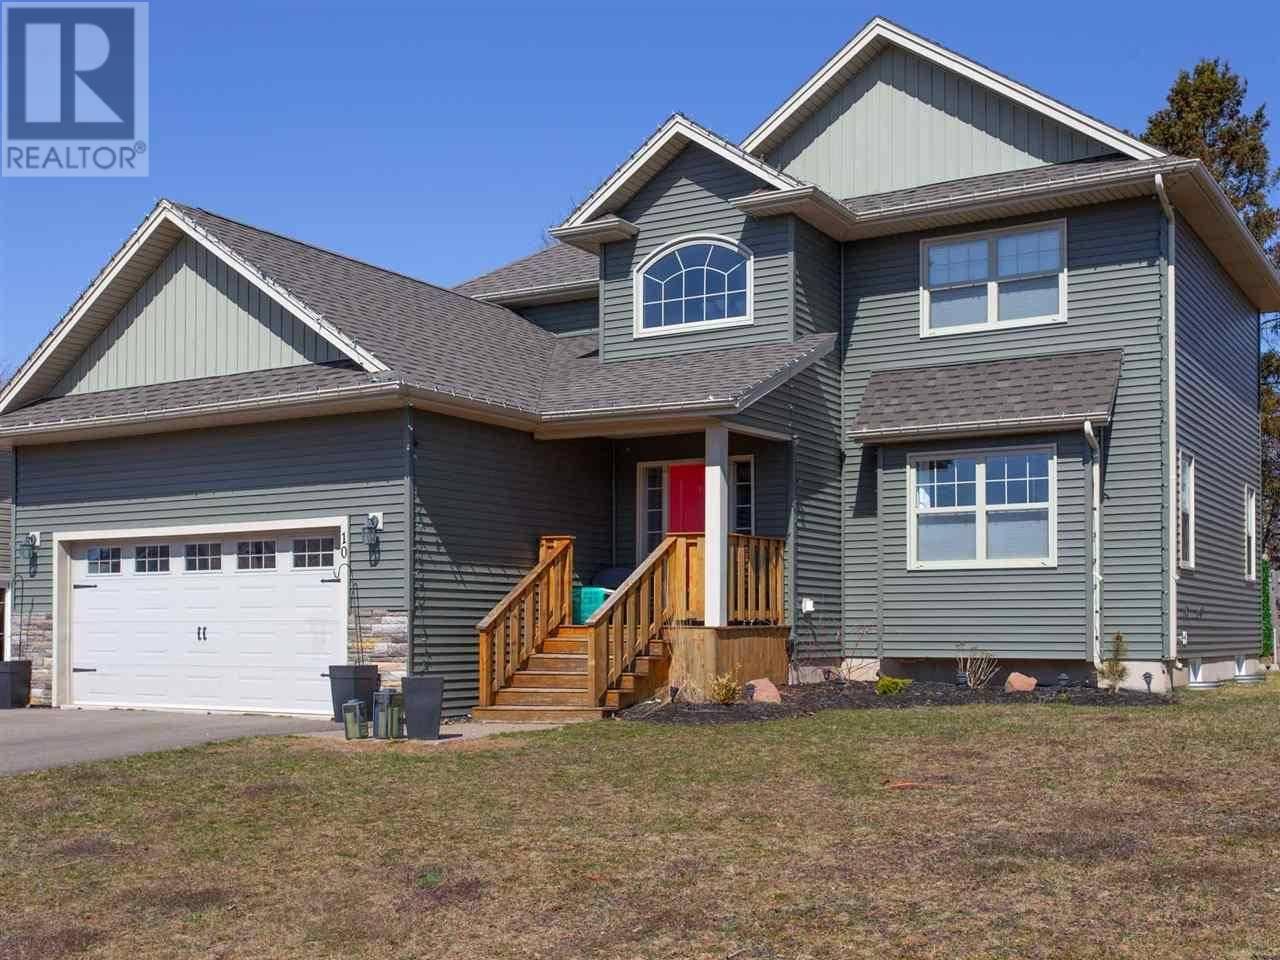 House for sale at 10 Horseshoe Blvd Charlottetown Prince Edward Island - MLS: 202004630